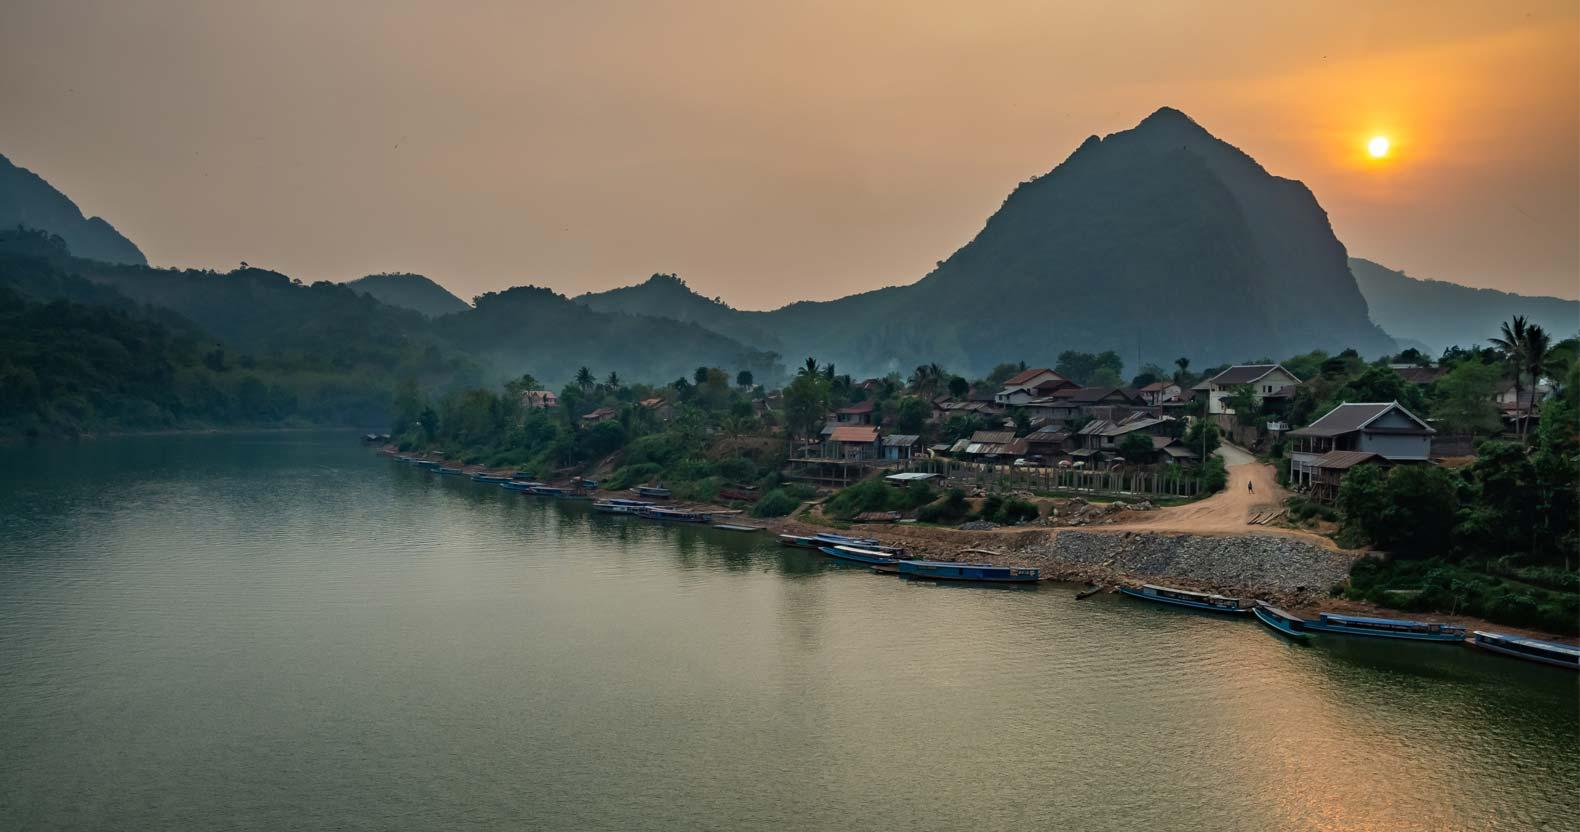 Nong Khiaw: rural Laos at its best